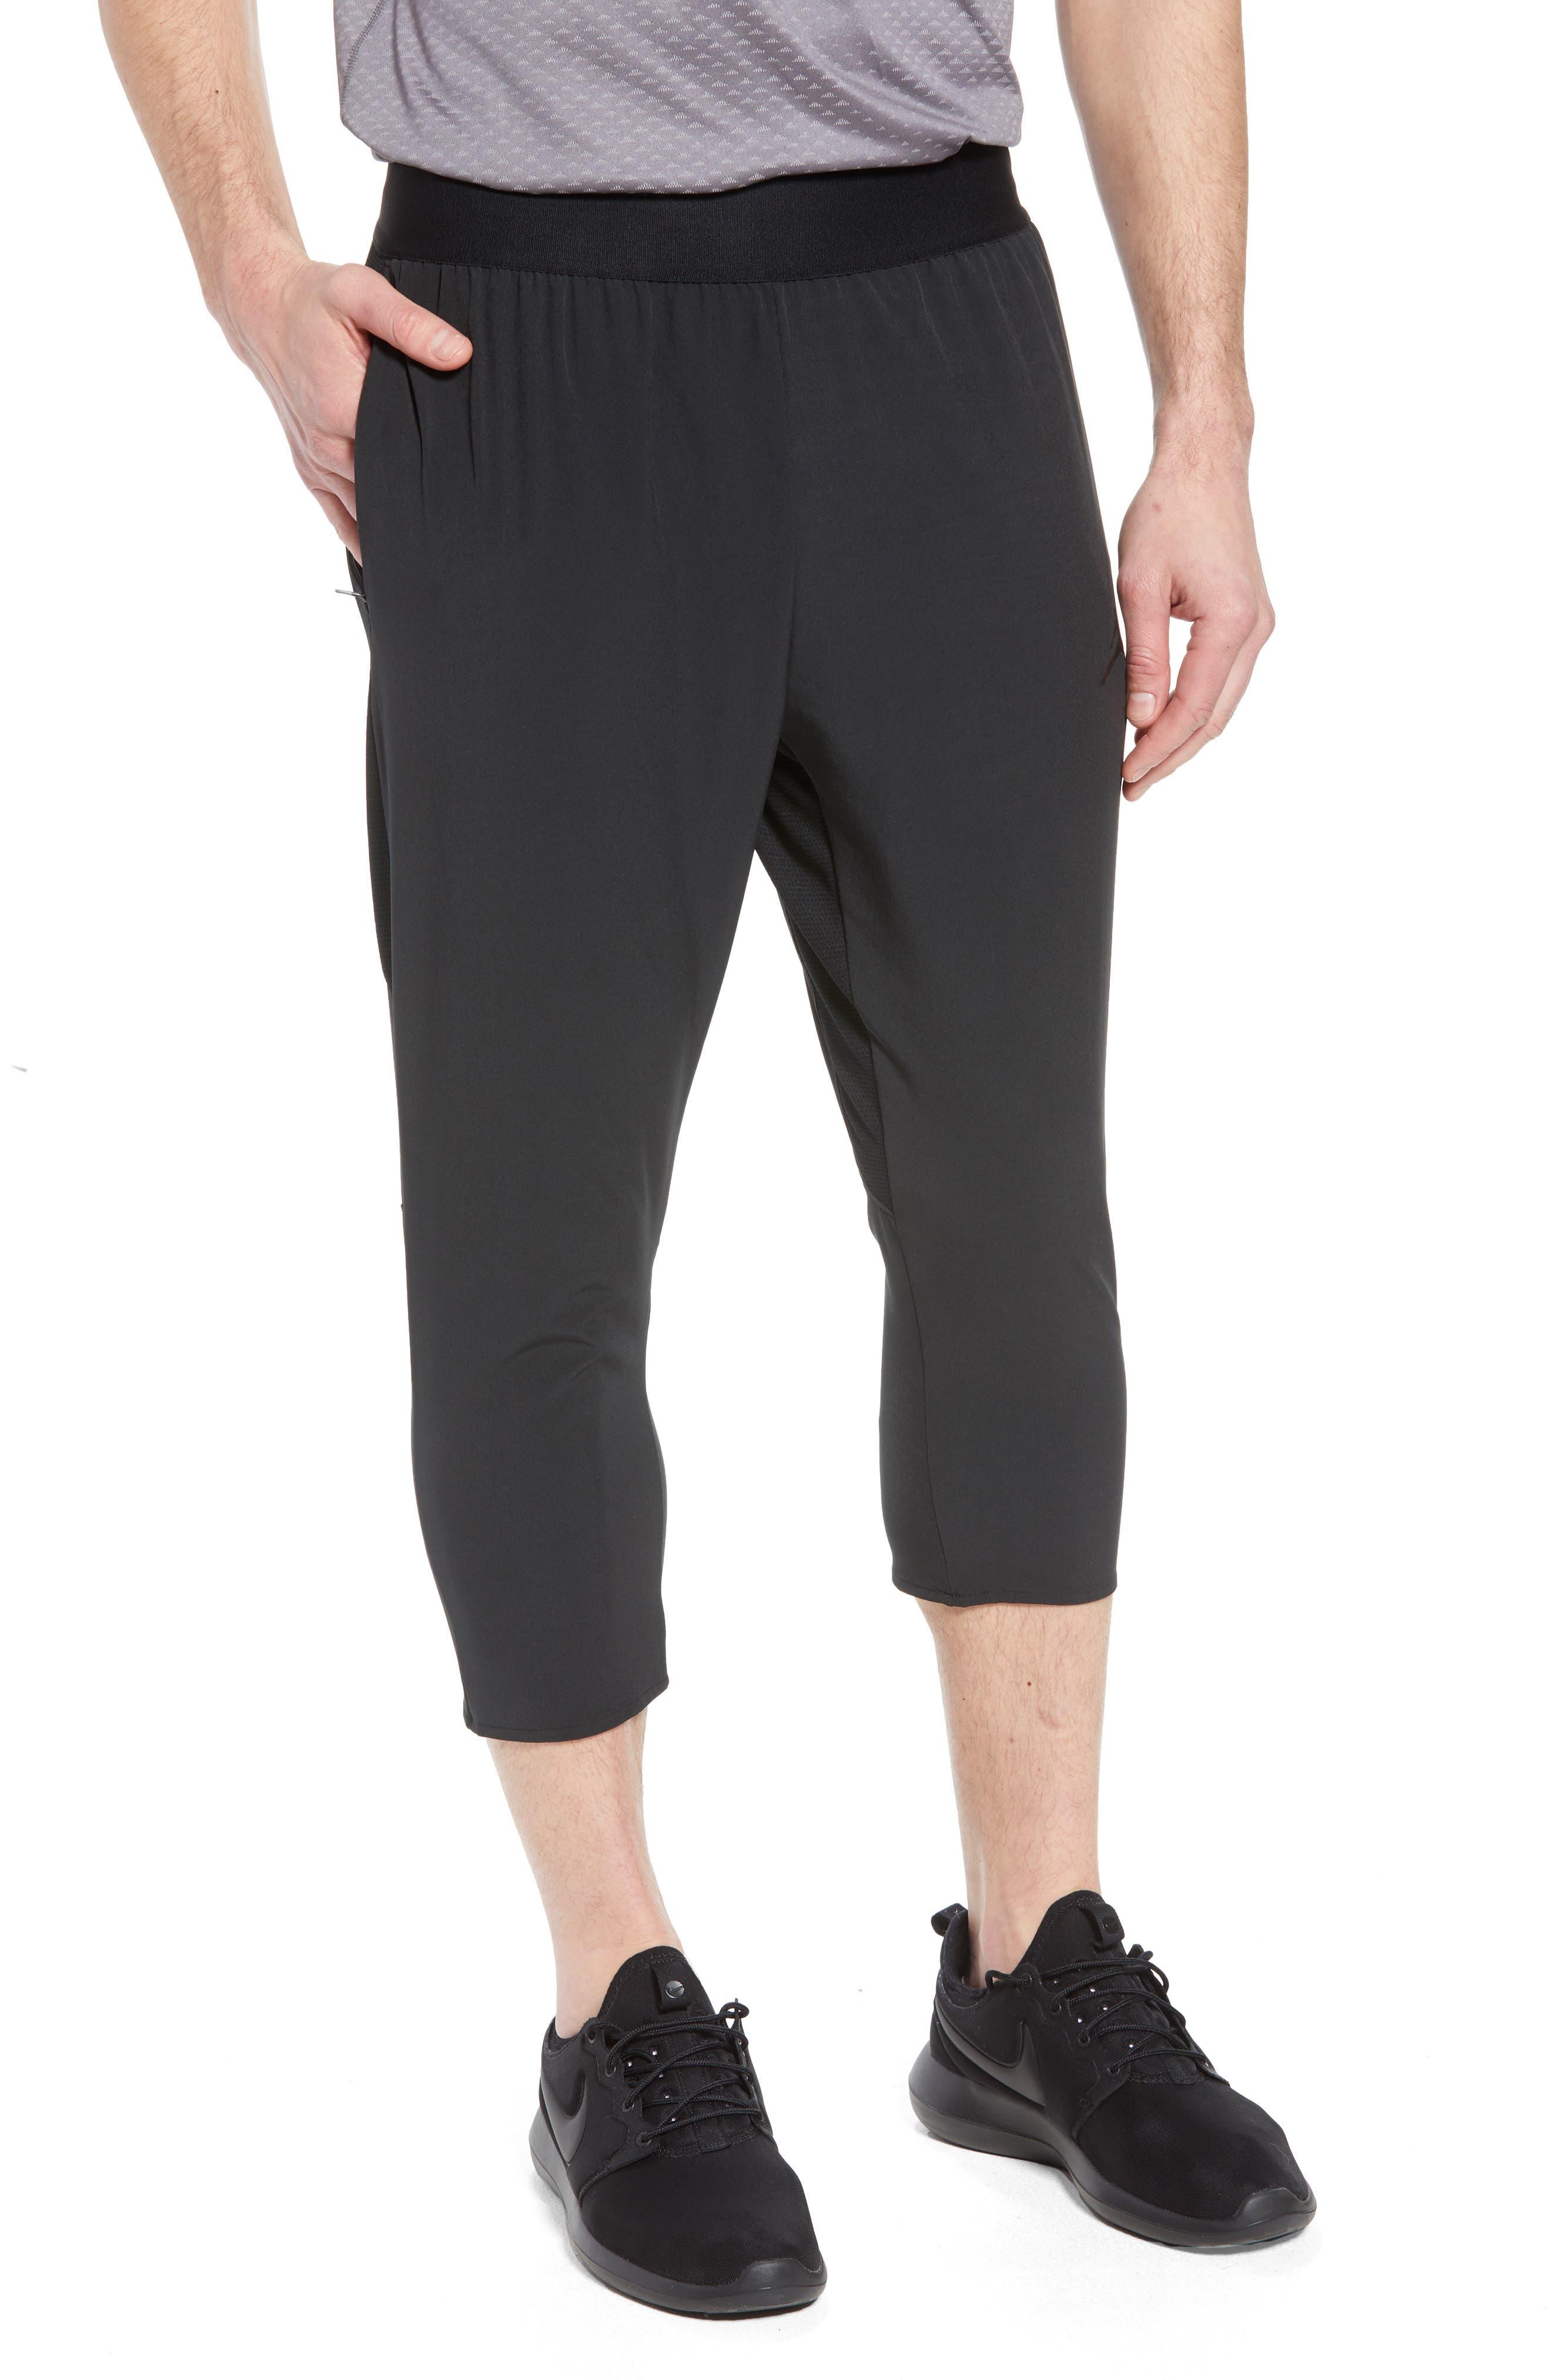 Ult Flight Pants,                         Main,                         color, Black/ Black